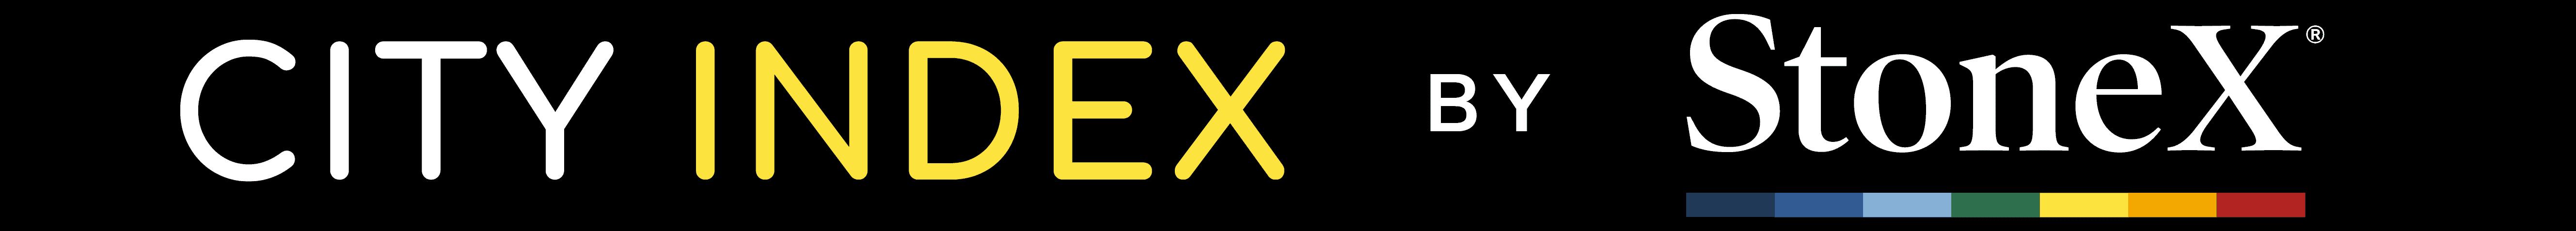 City-Index-by-StoneX